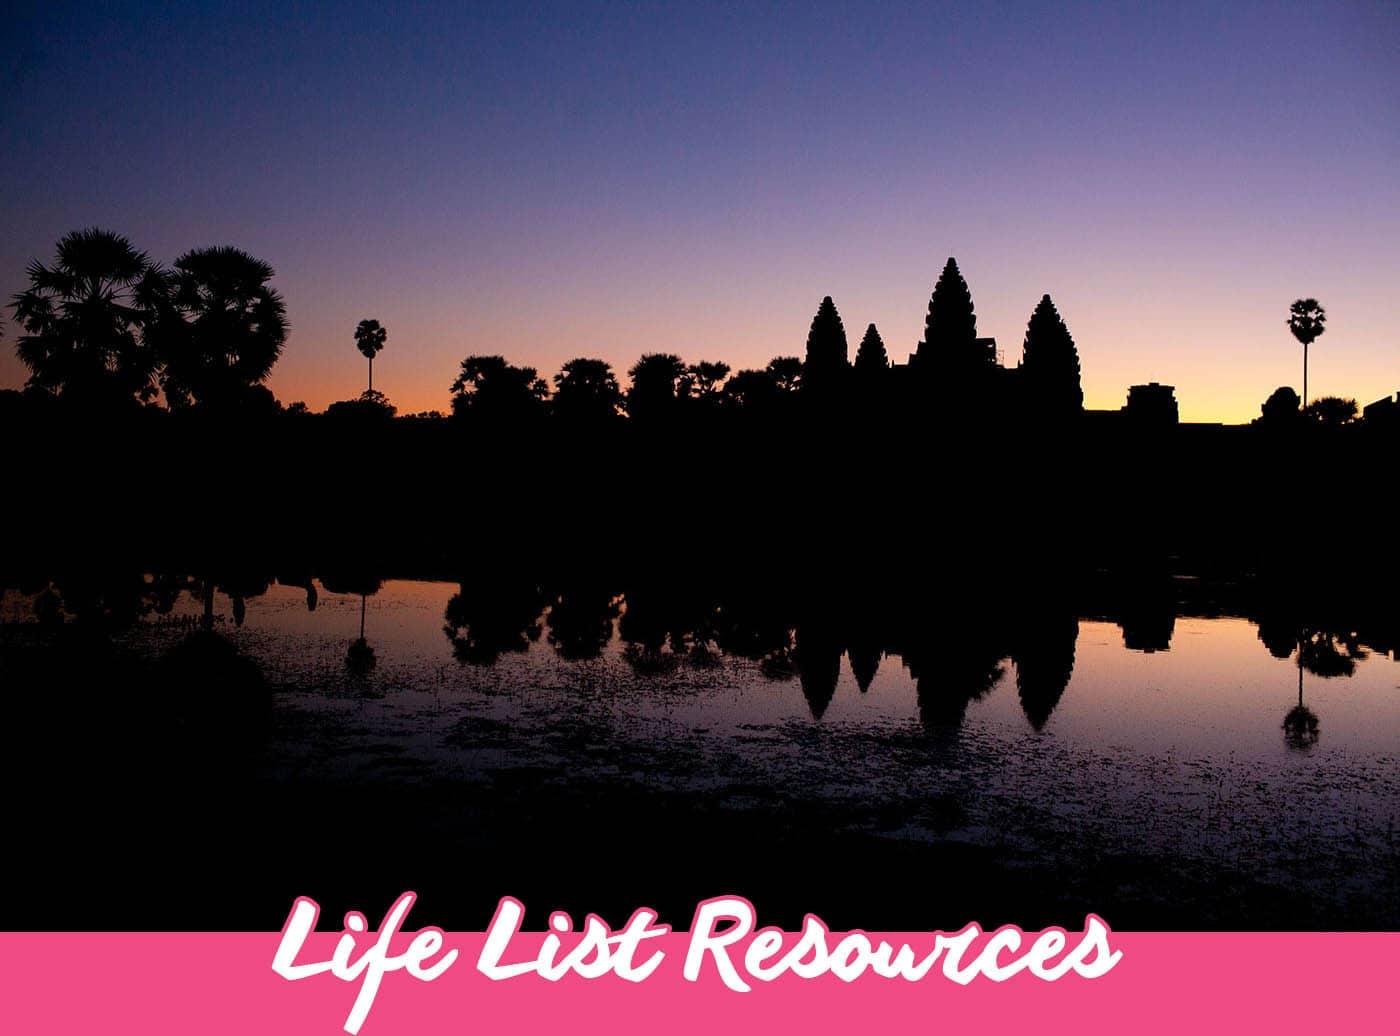 Life List Resources - Plan Your Life List/Bucket List | Bucket List Inspiration & Ideas